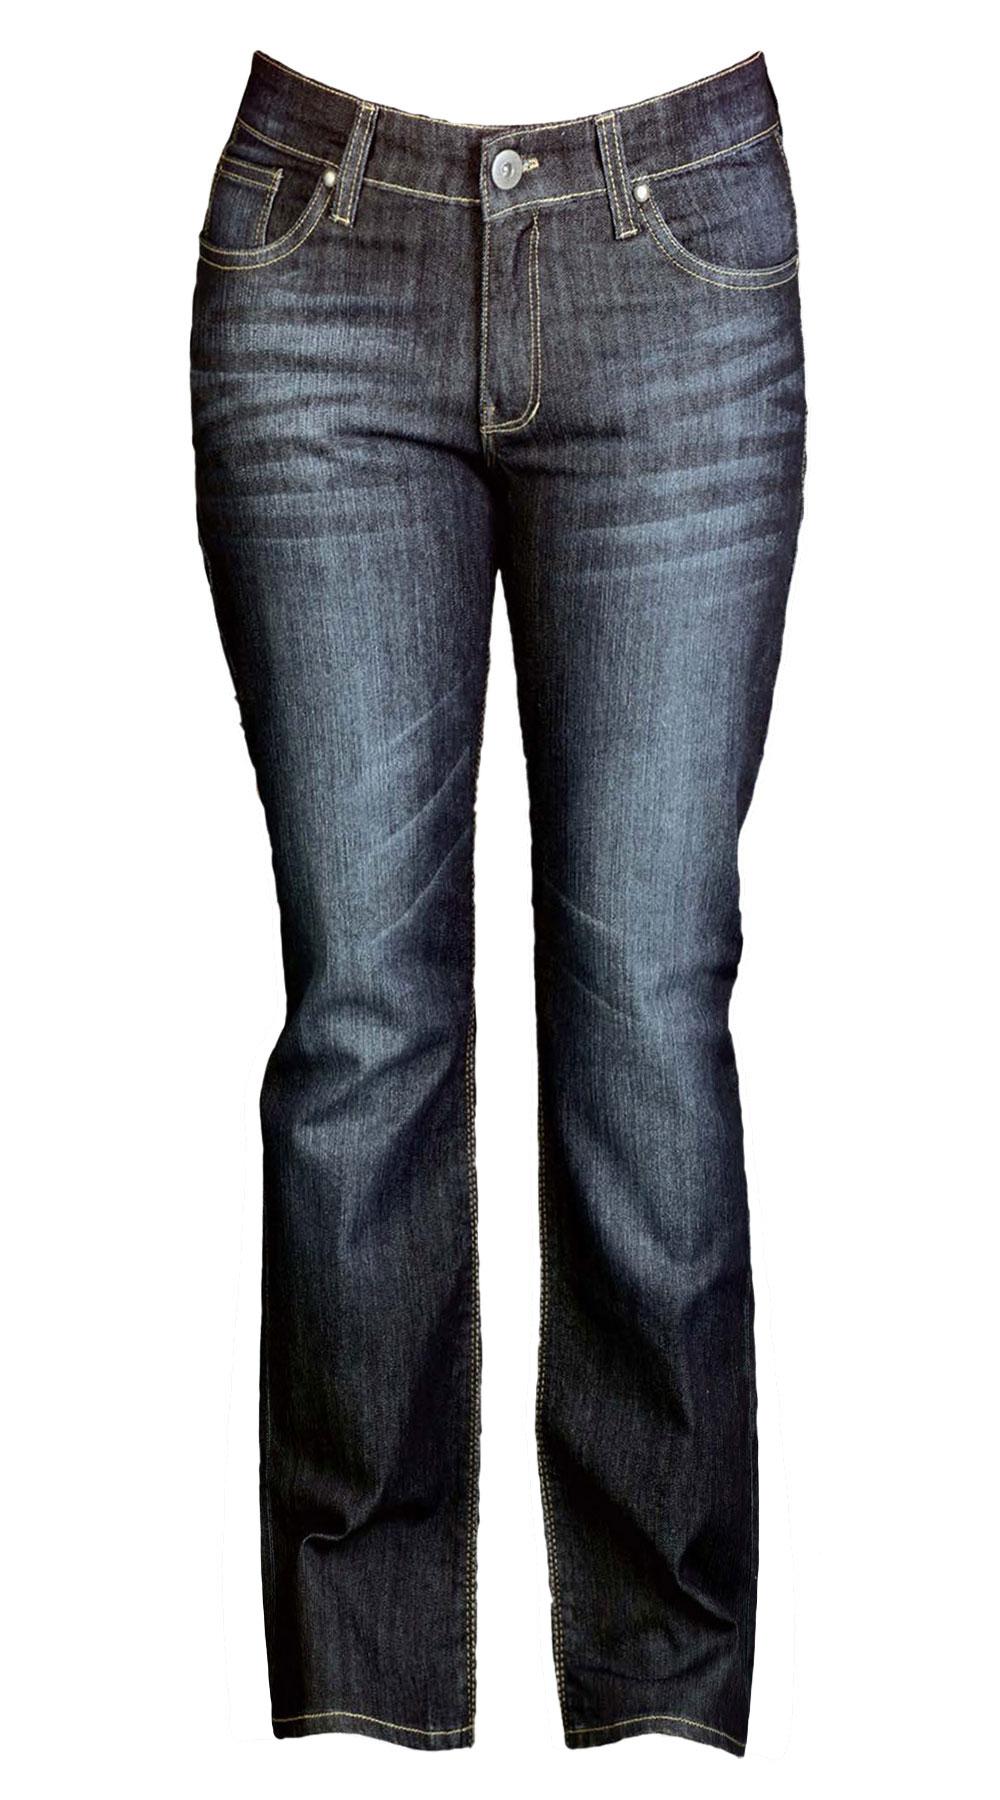 Women Motorcycle Jeans | Safest, Stylish & Comfortable ...